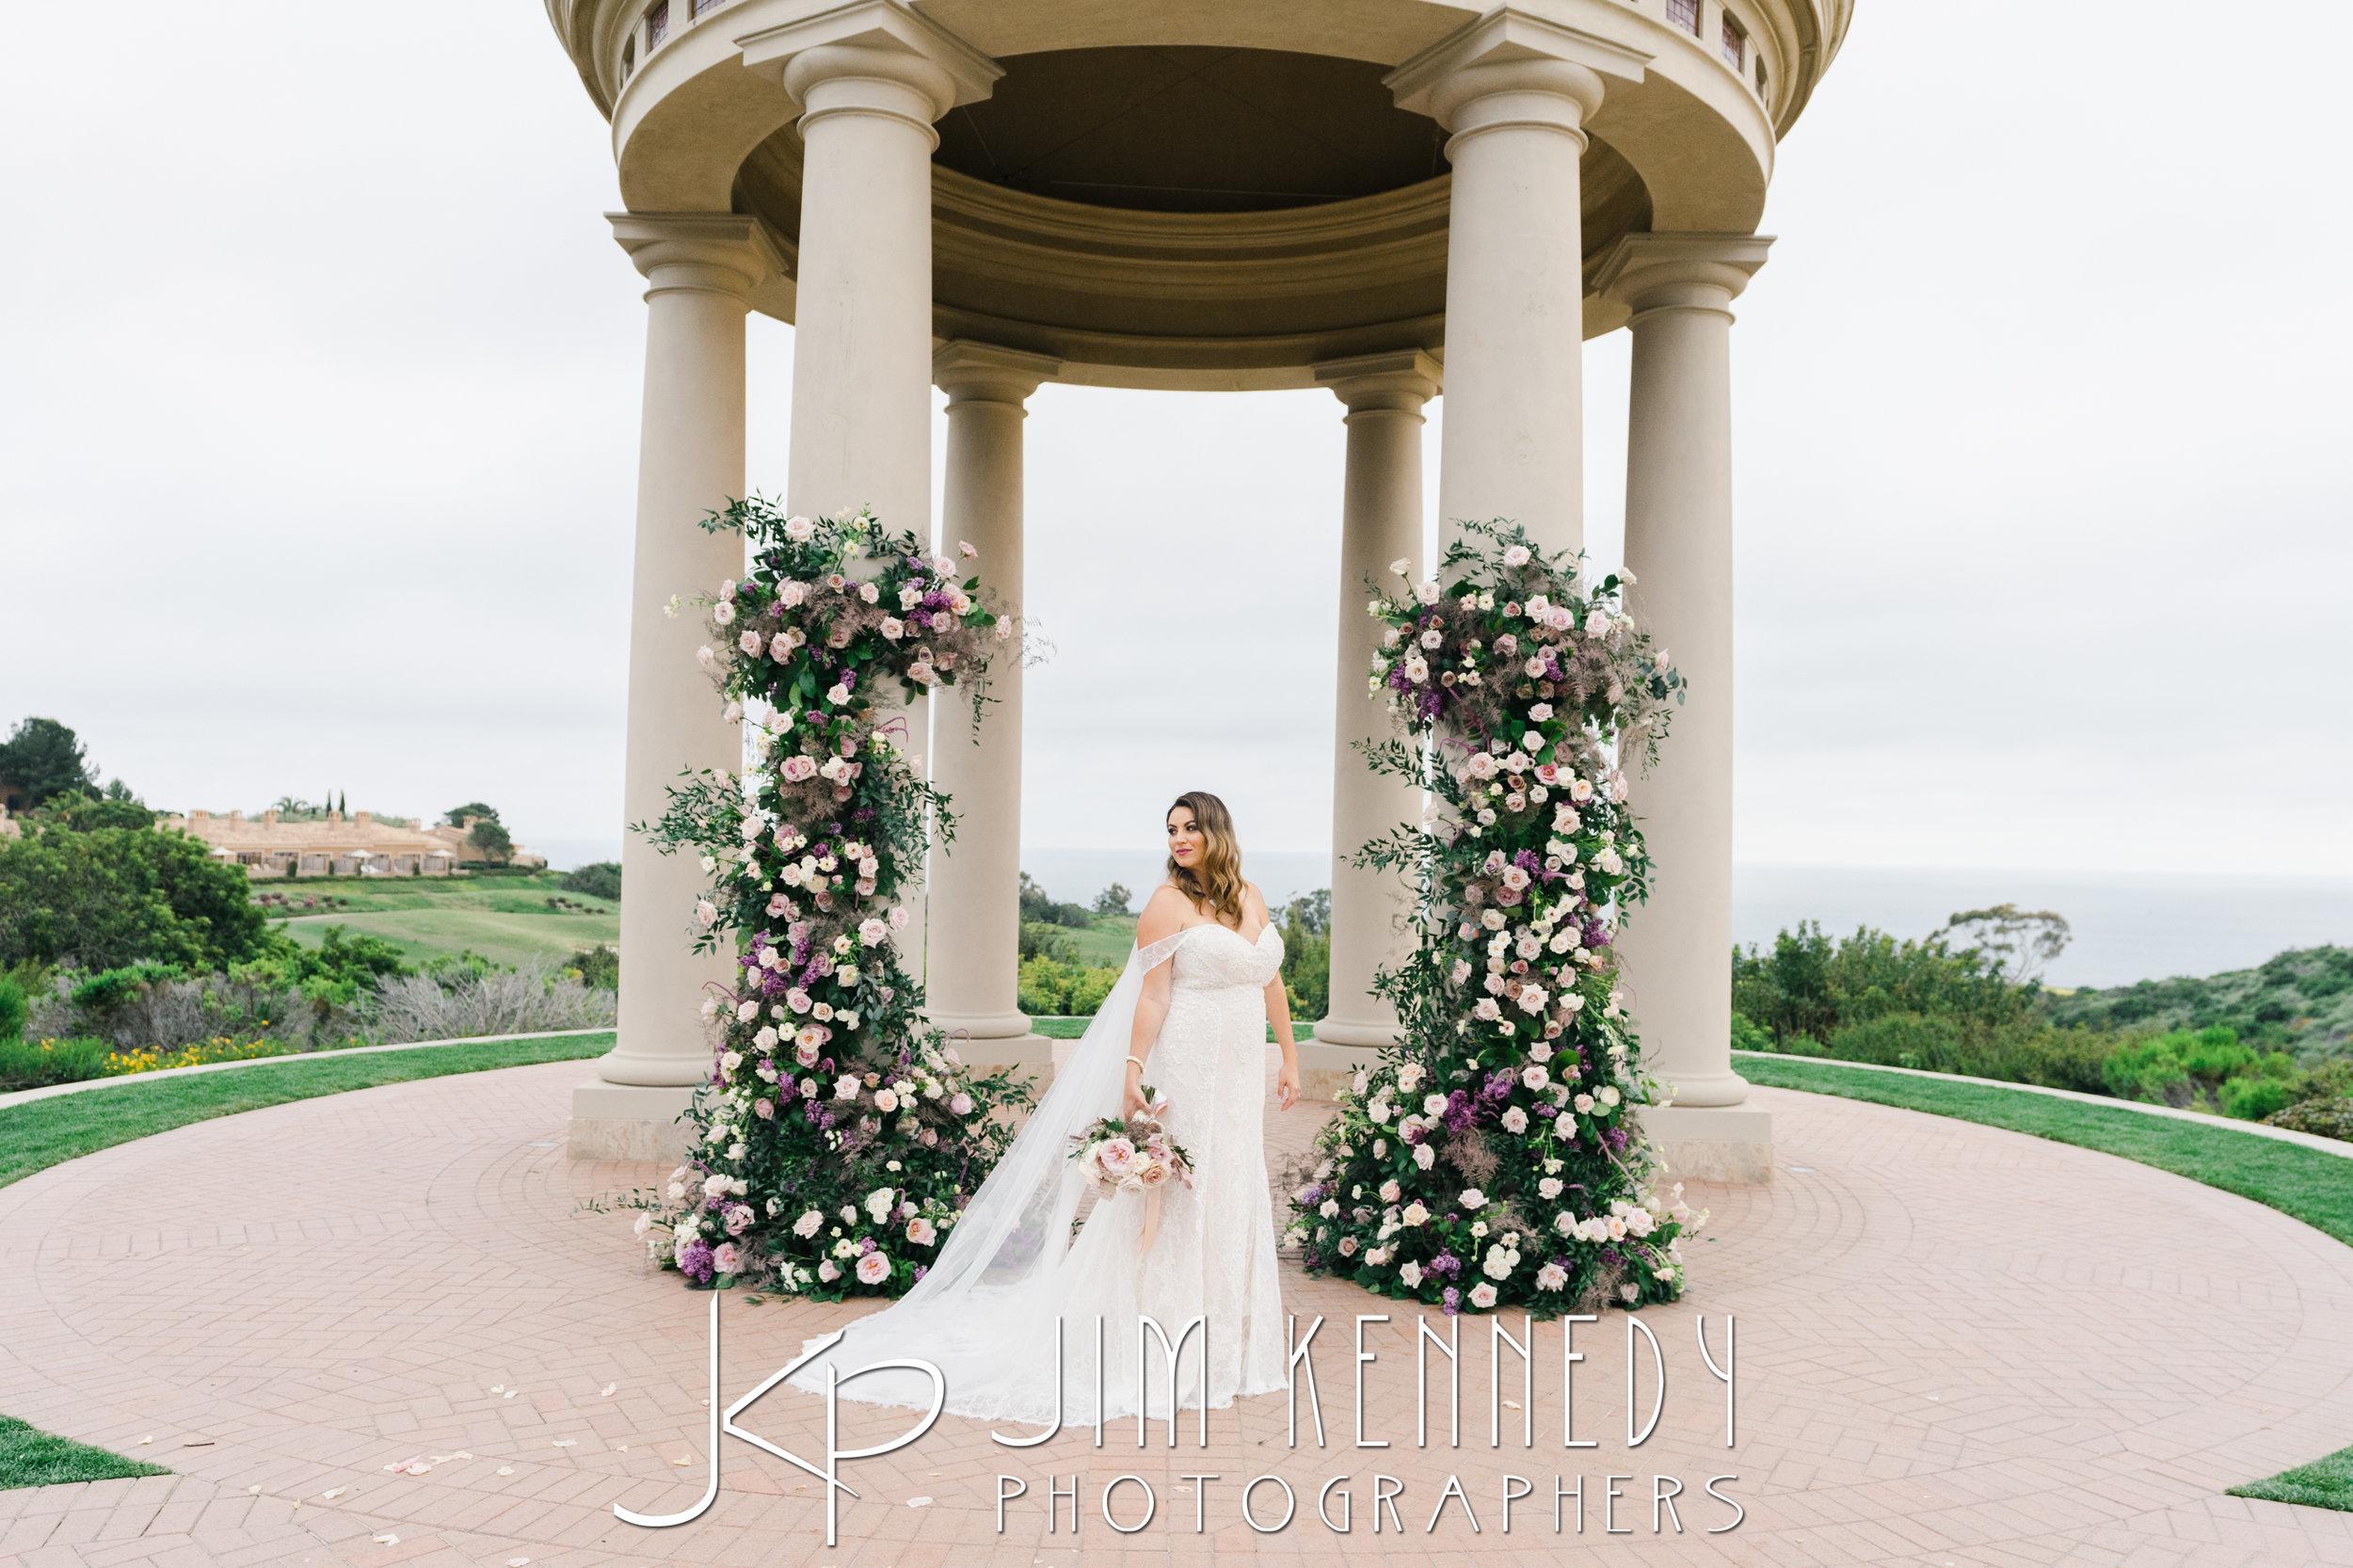 pelican-hill-wedding-jim-kenedy-photographers_0163.JPG